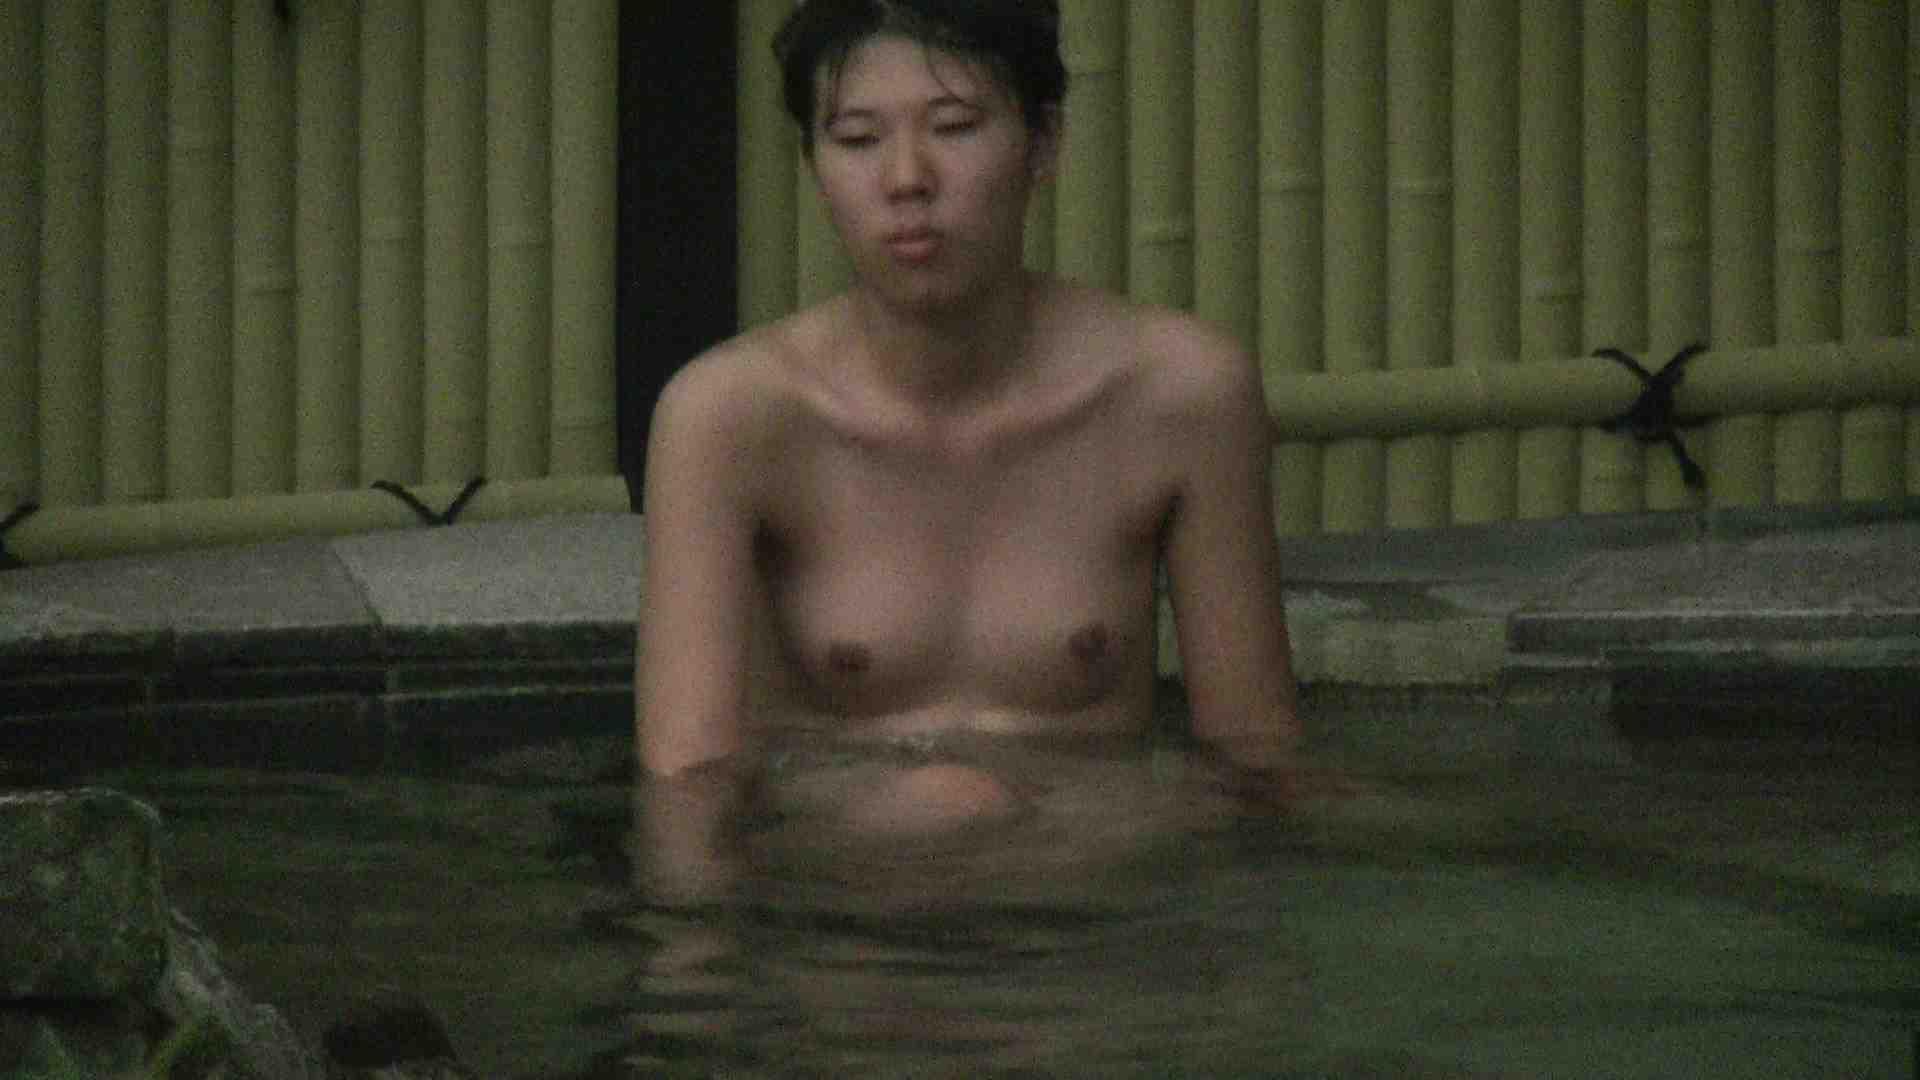 Aquaな露天風呂Vol.215 盗撮 おまんこ無修正動画無料 106枚 65